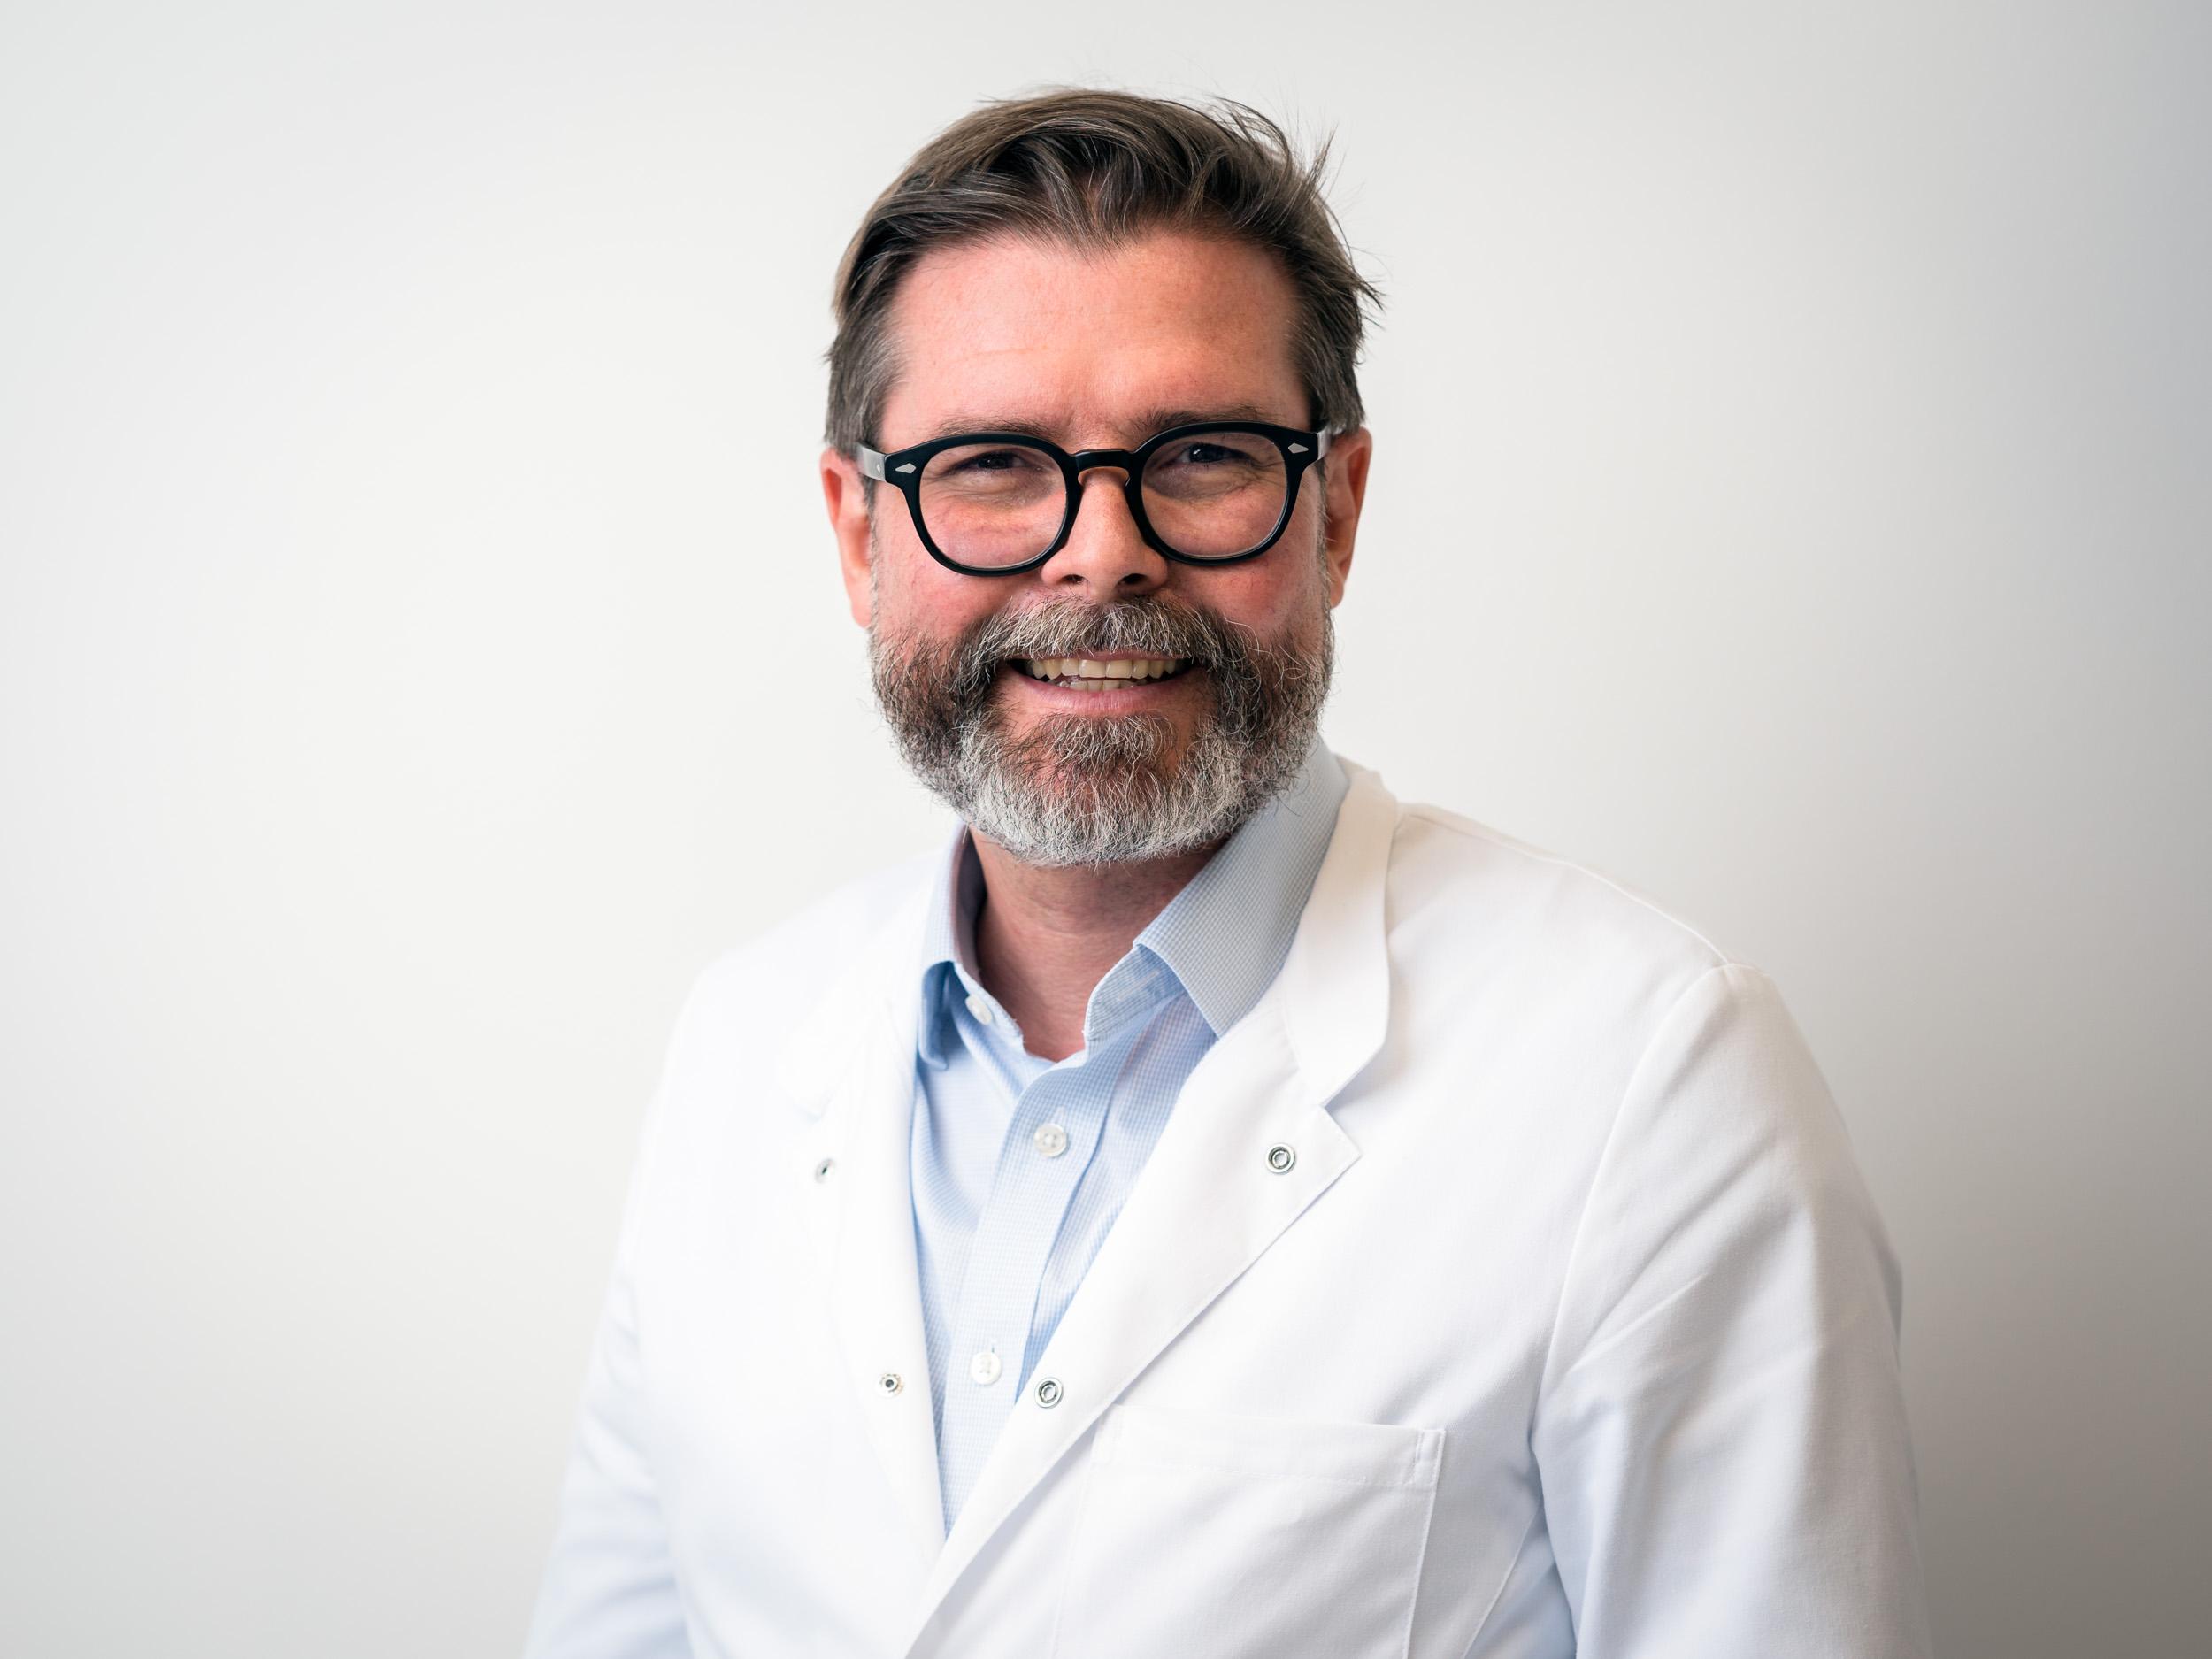 Dermatologie Klinik Zürich - Dr. med. Markus Dendorfer